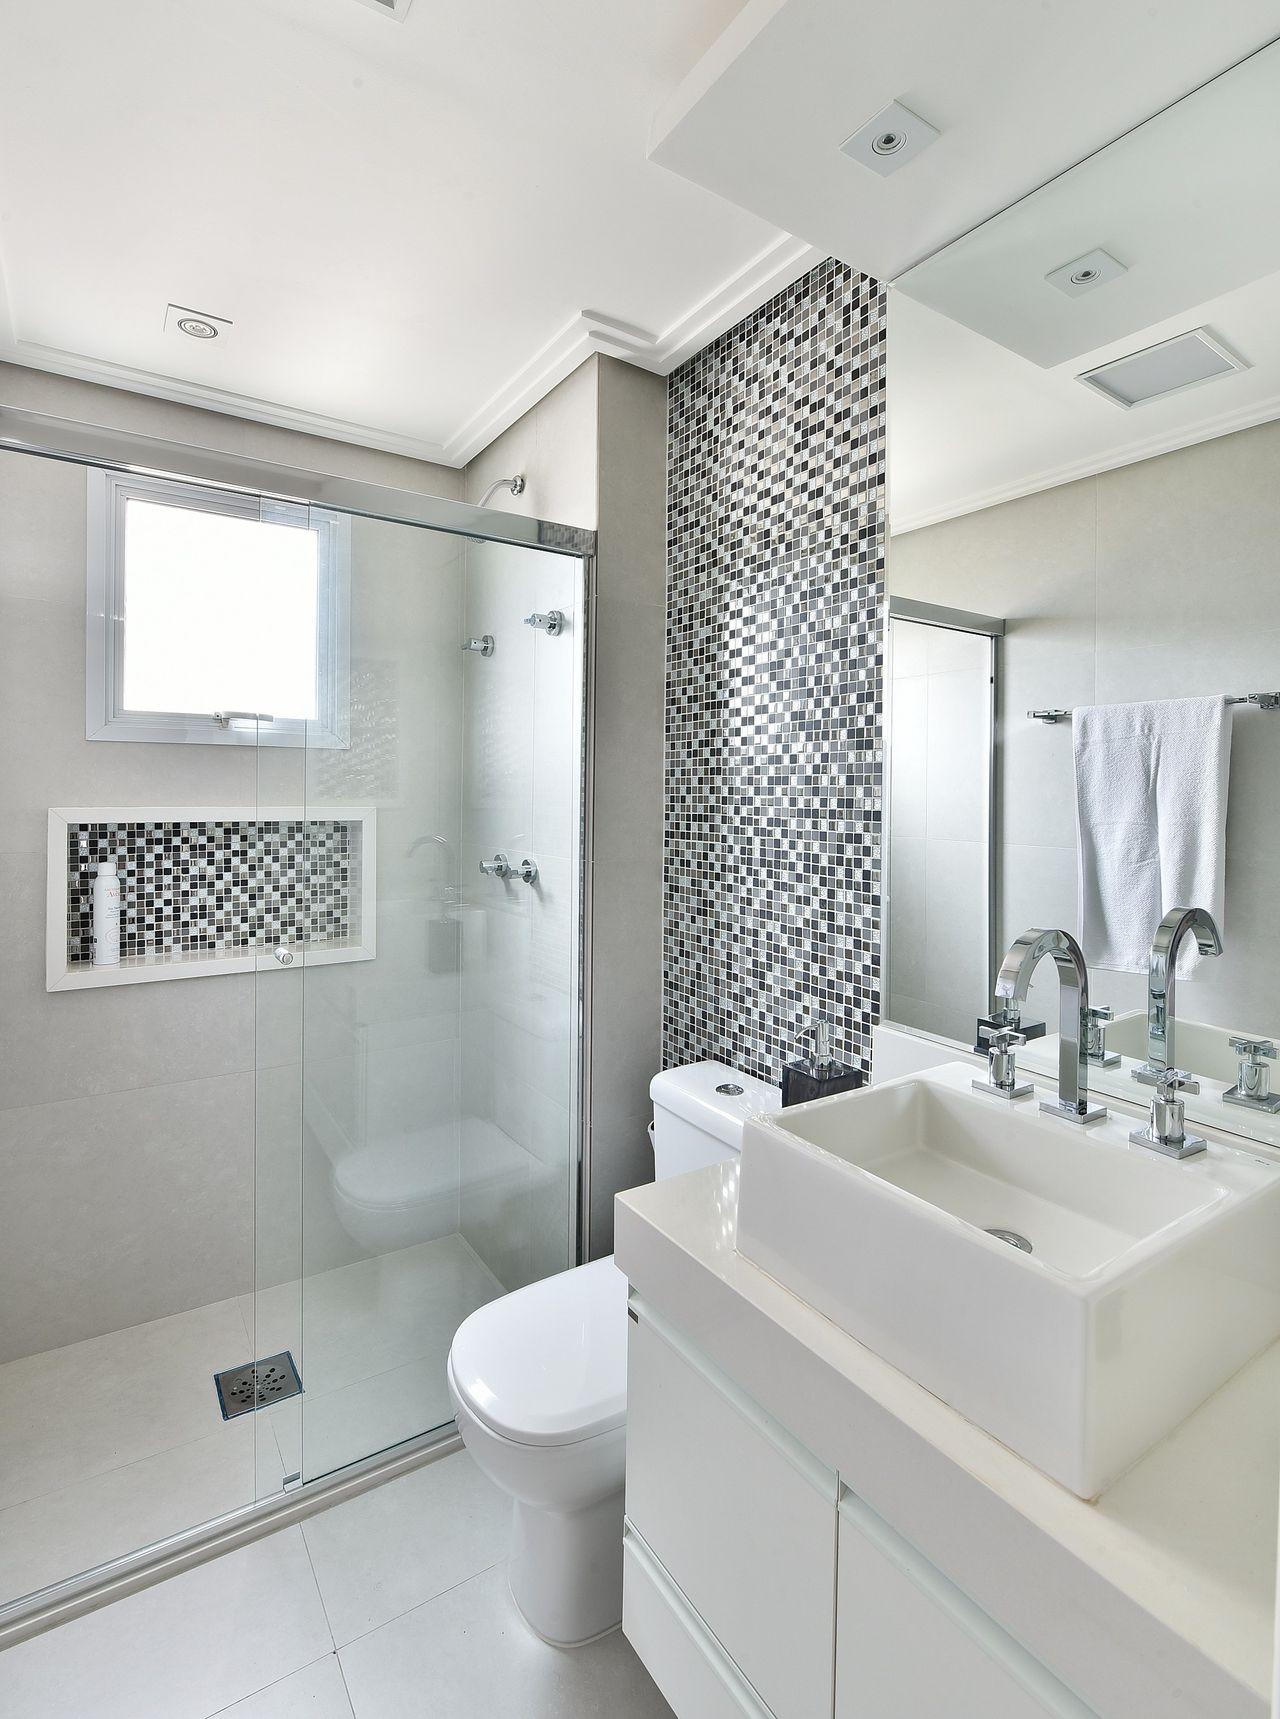 #474636 Decorao De Interiores Banheiros. With Decorao De Interiores Banheiros. Truques Para Decorar Um  1280x1719 px Banheiro Simples Todo Branco 2018 3801